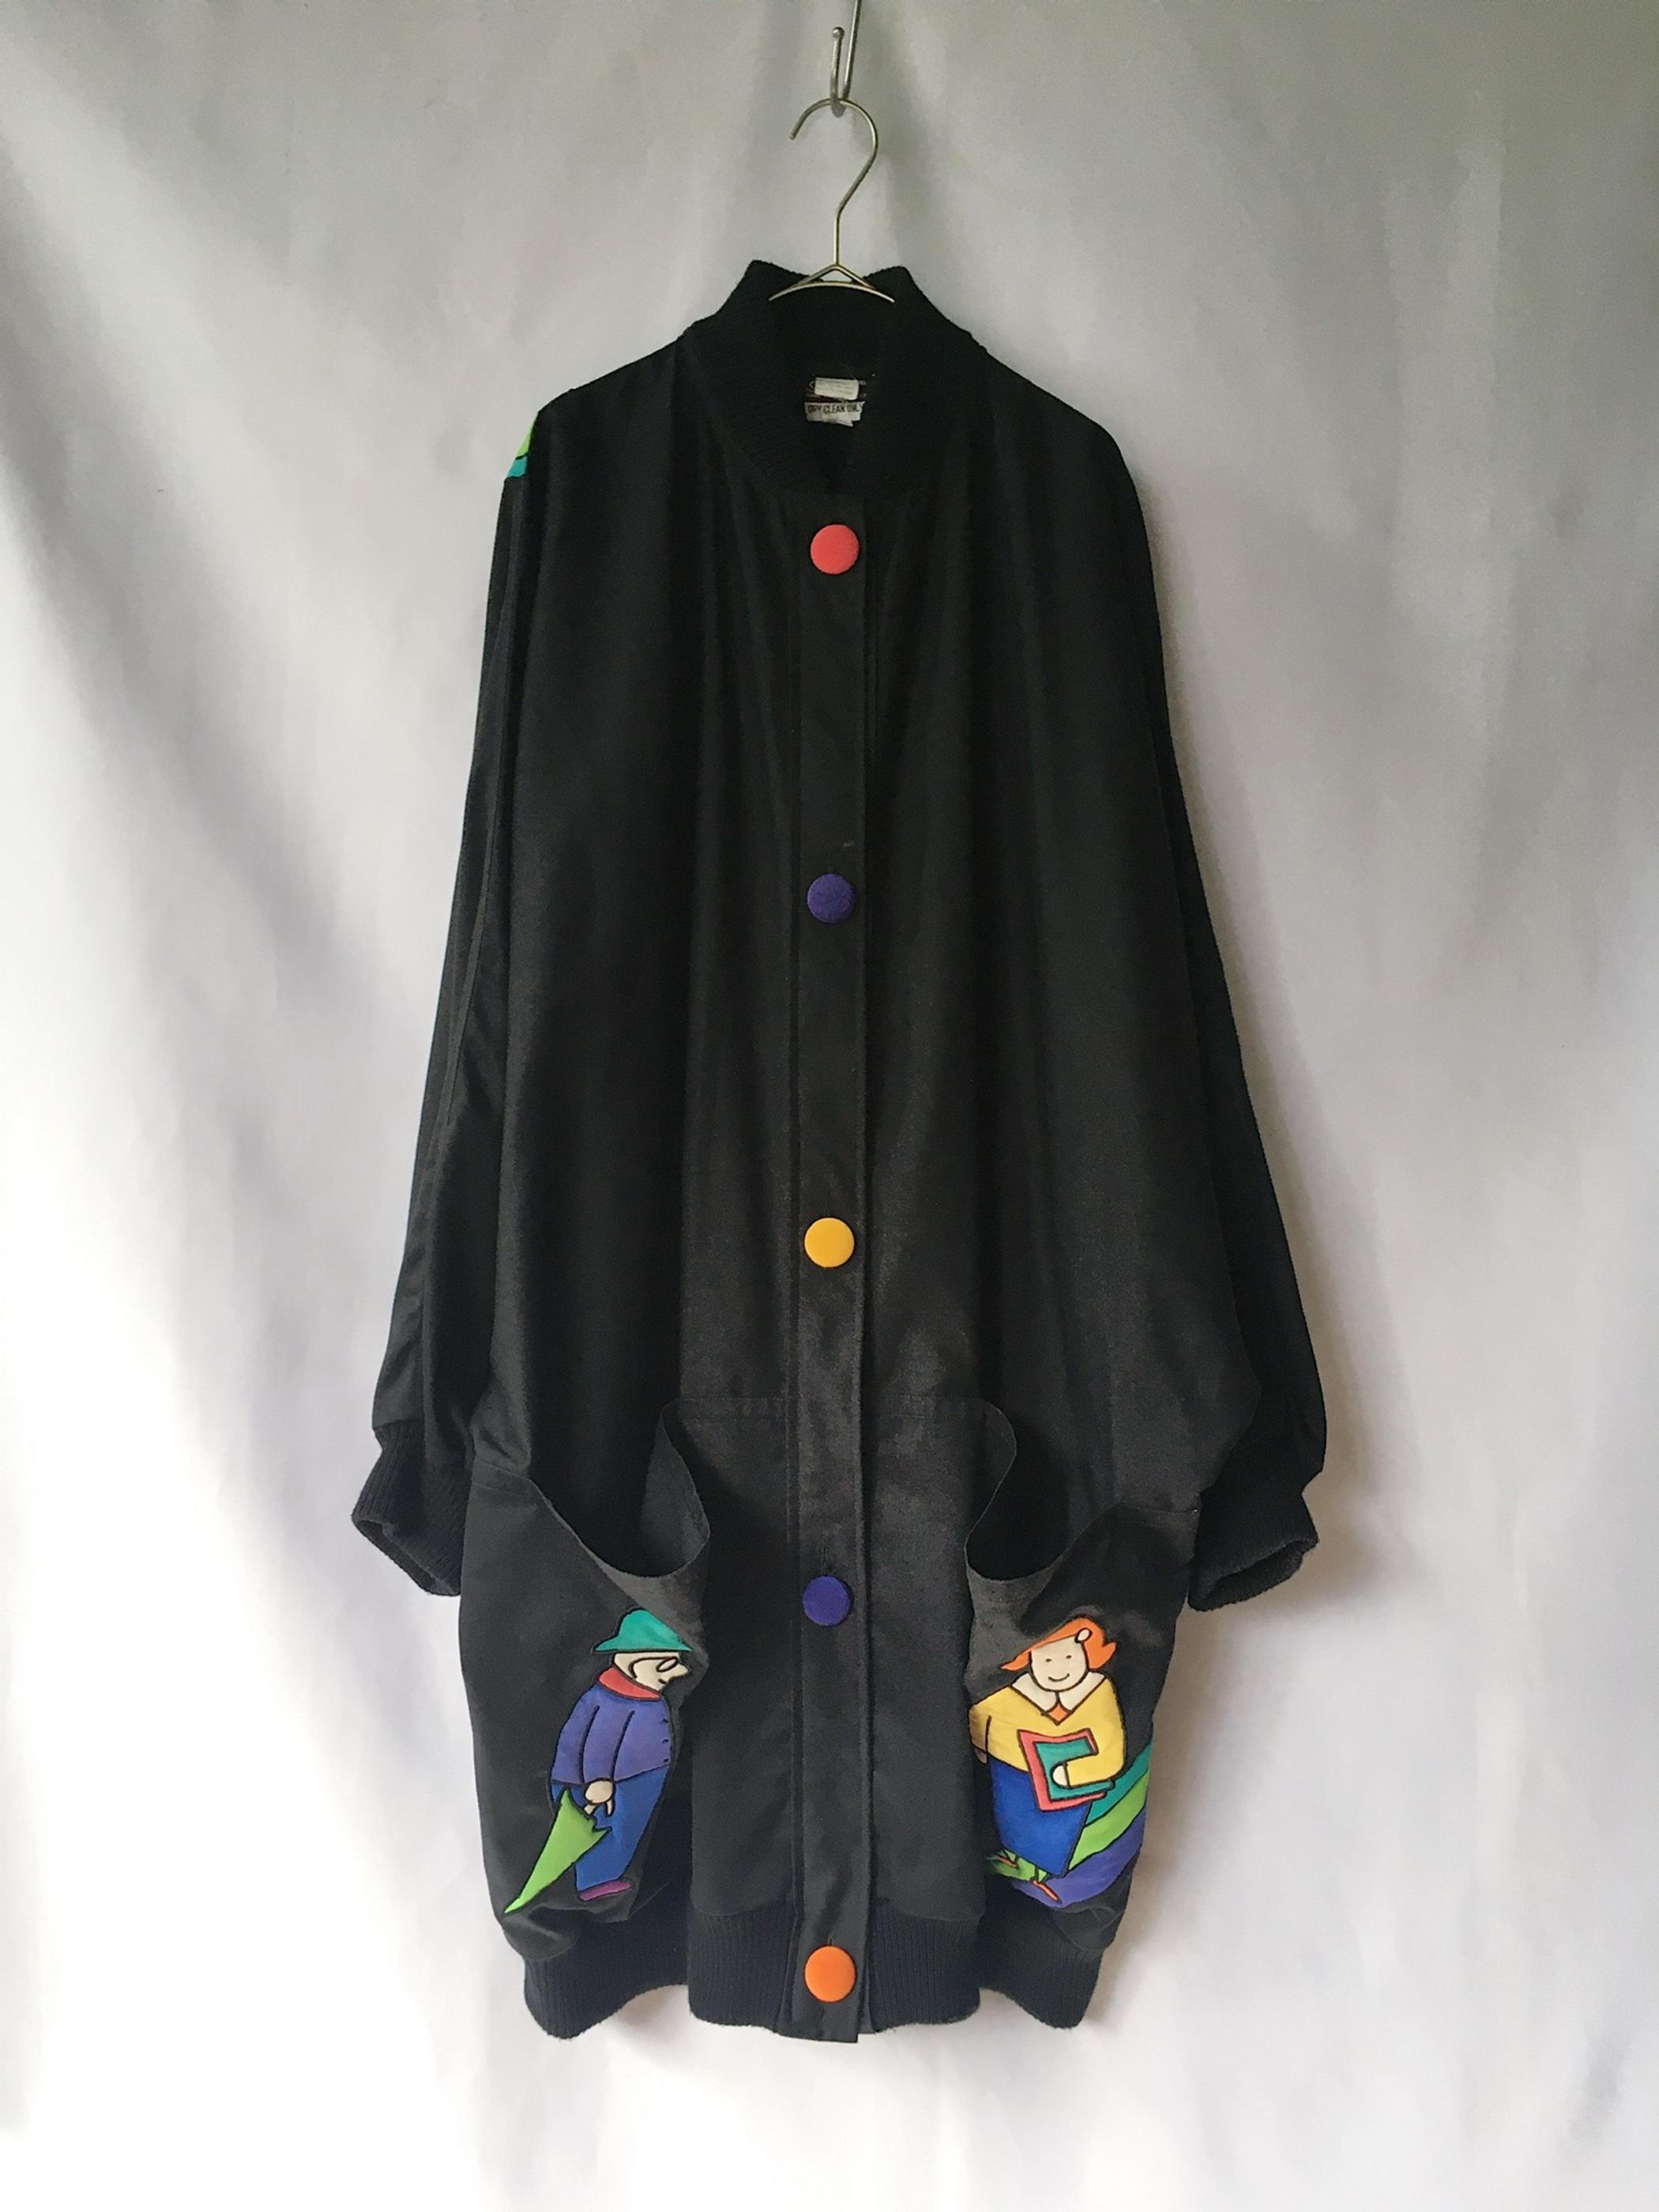 silk applique dolman sleeve jacket 80s